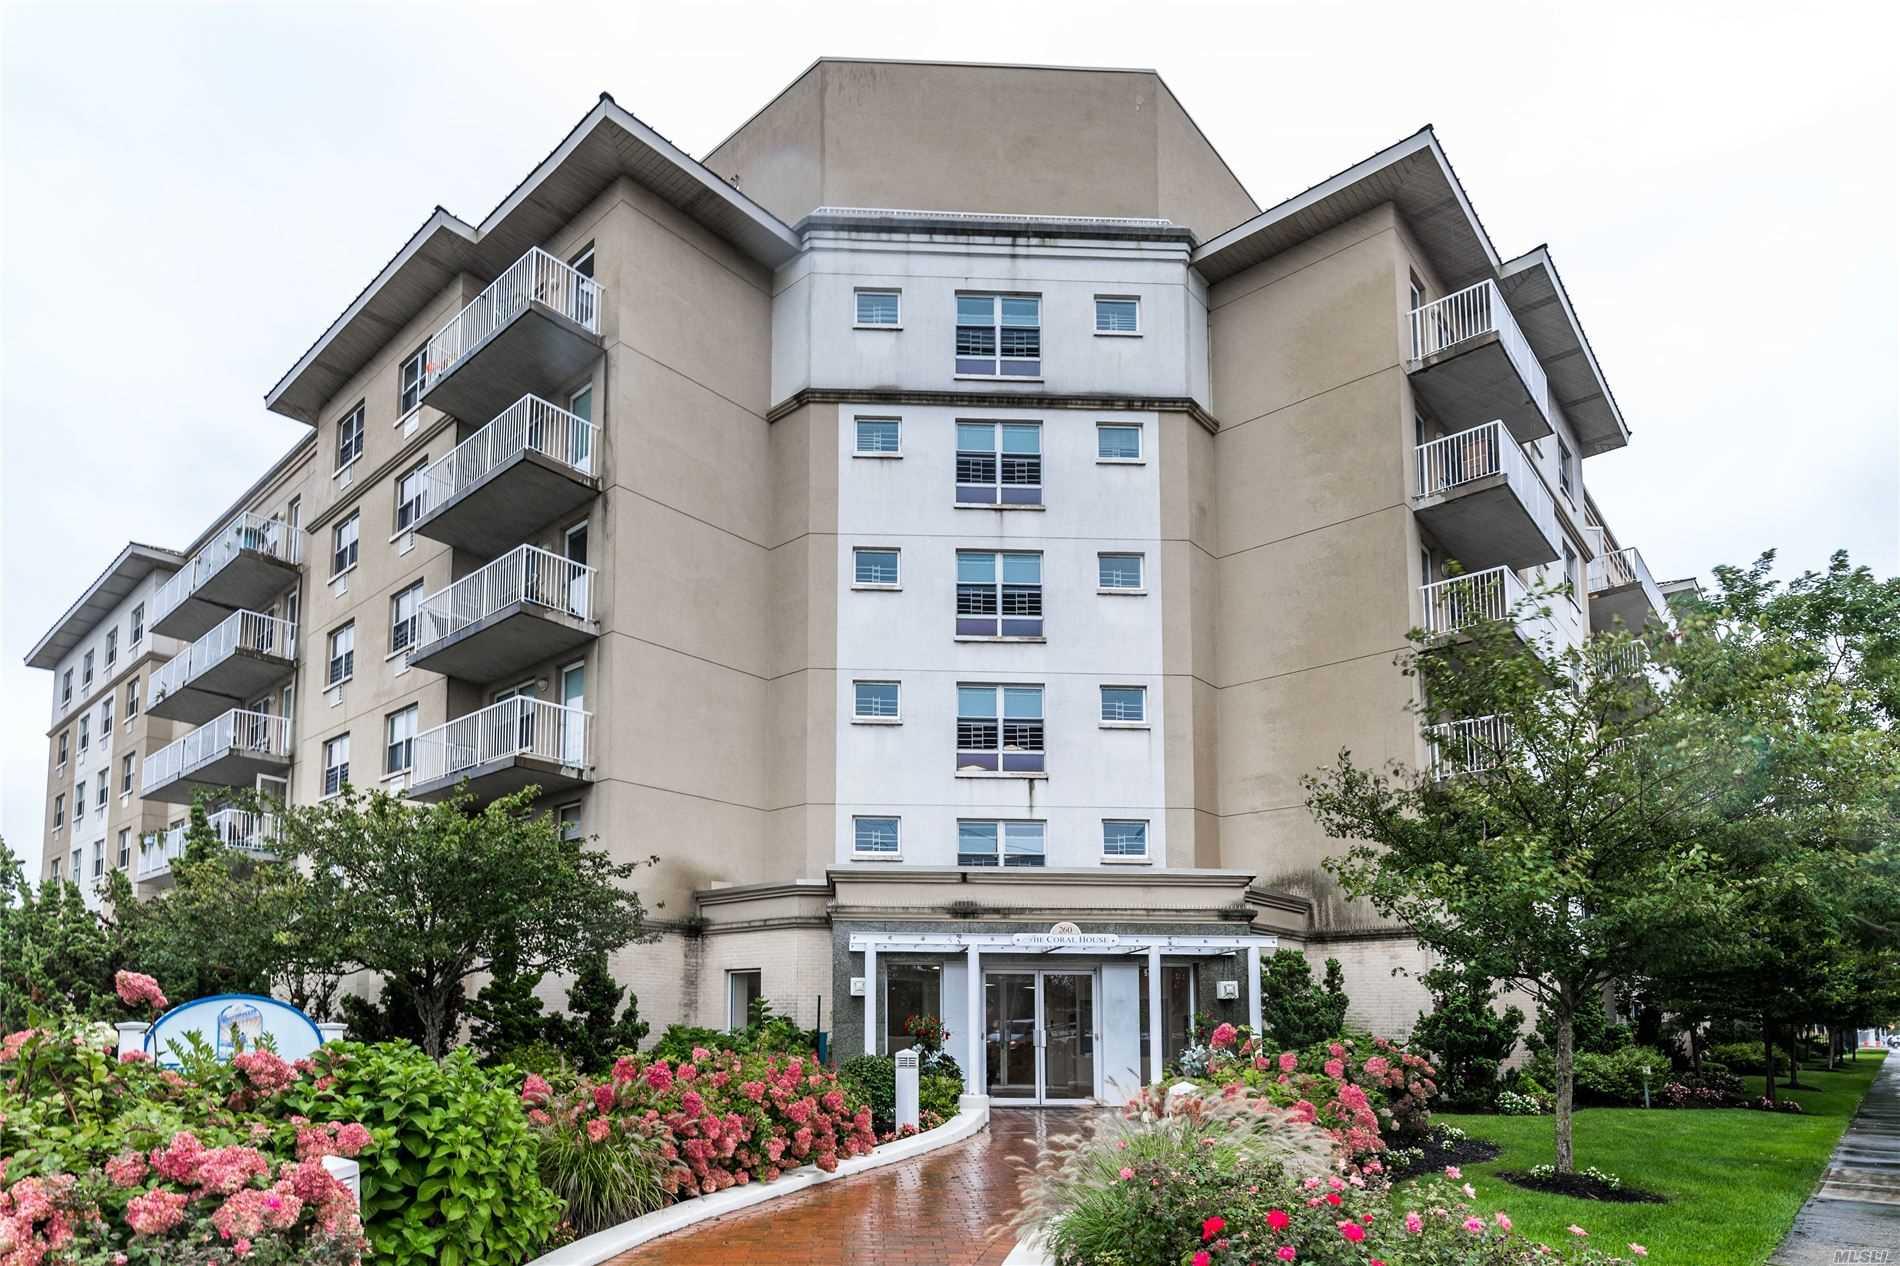 Property for sale at 260 Beach 81 Street # 2D, Arverne NY 11692, Arverne,  New York 11692